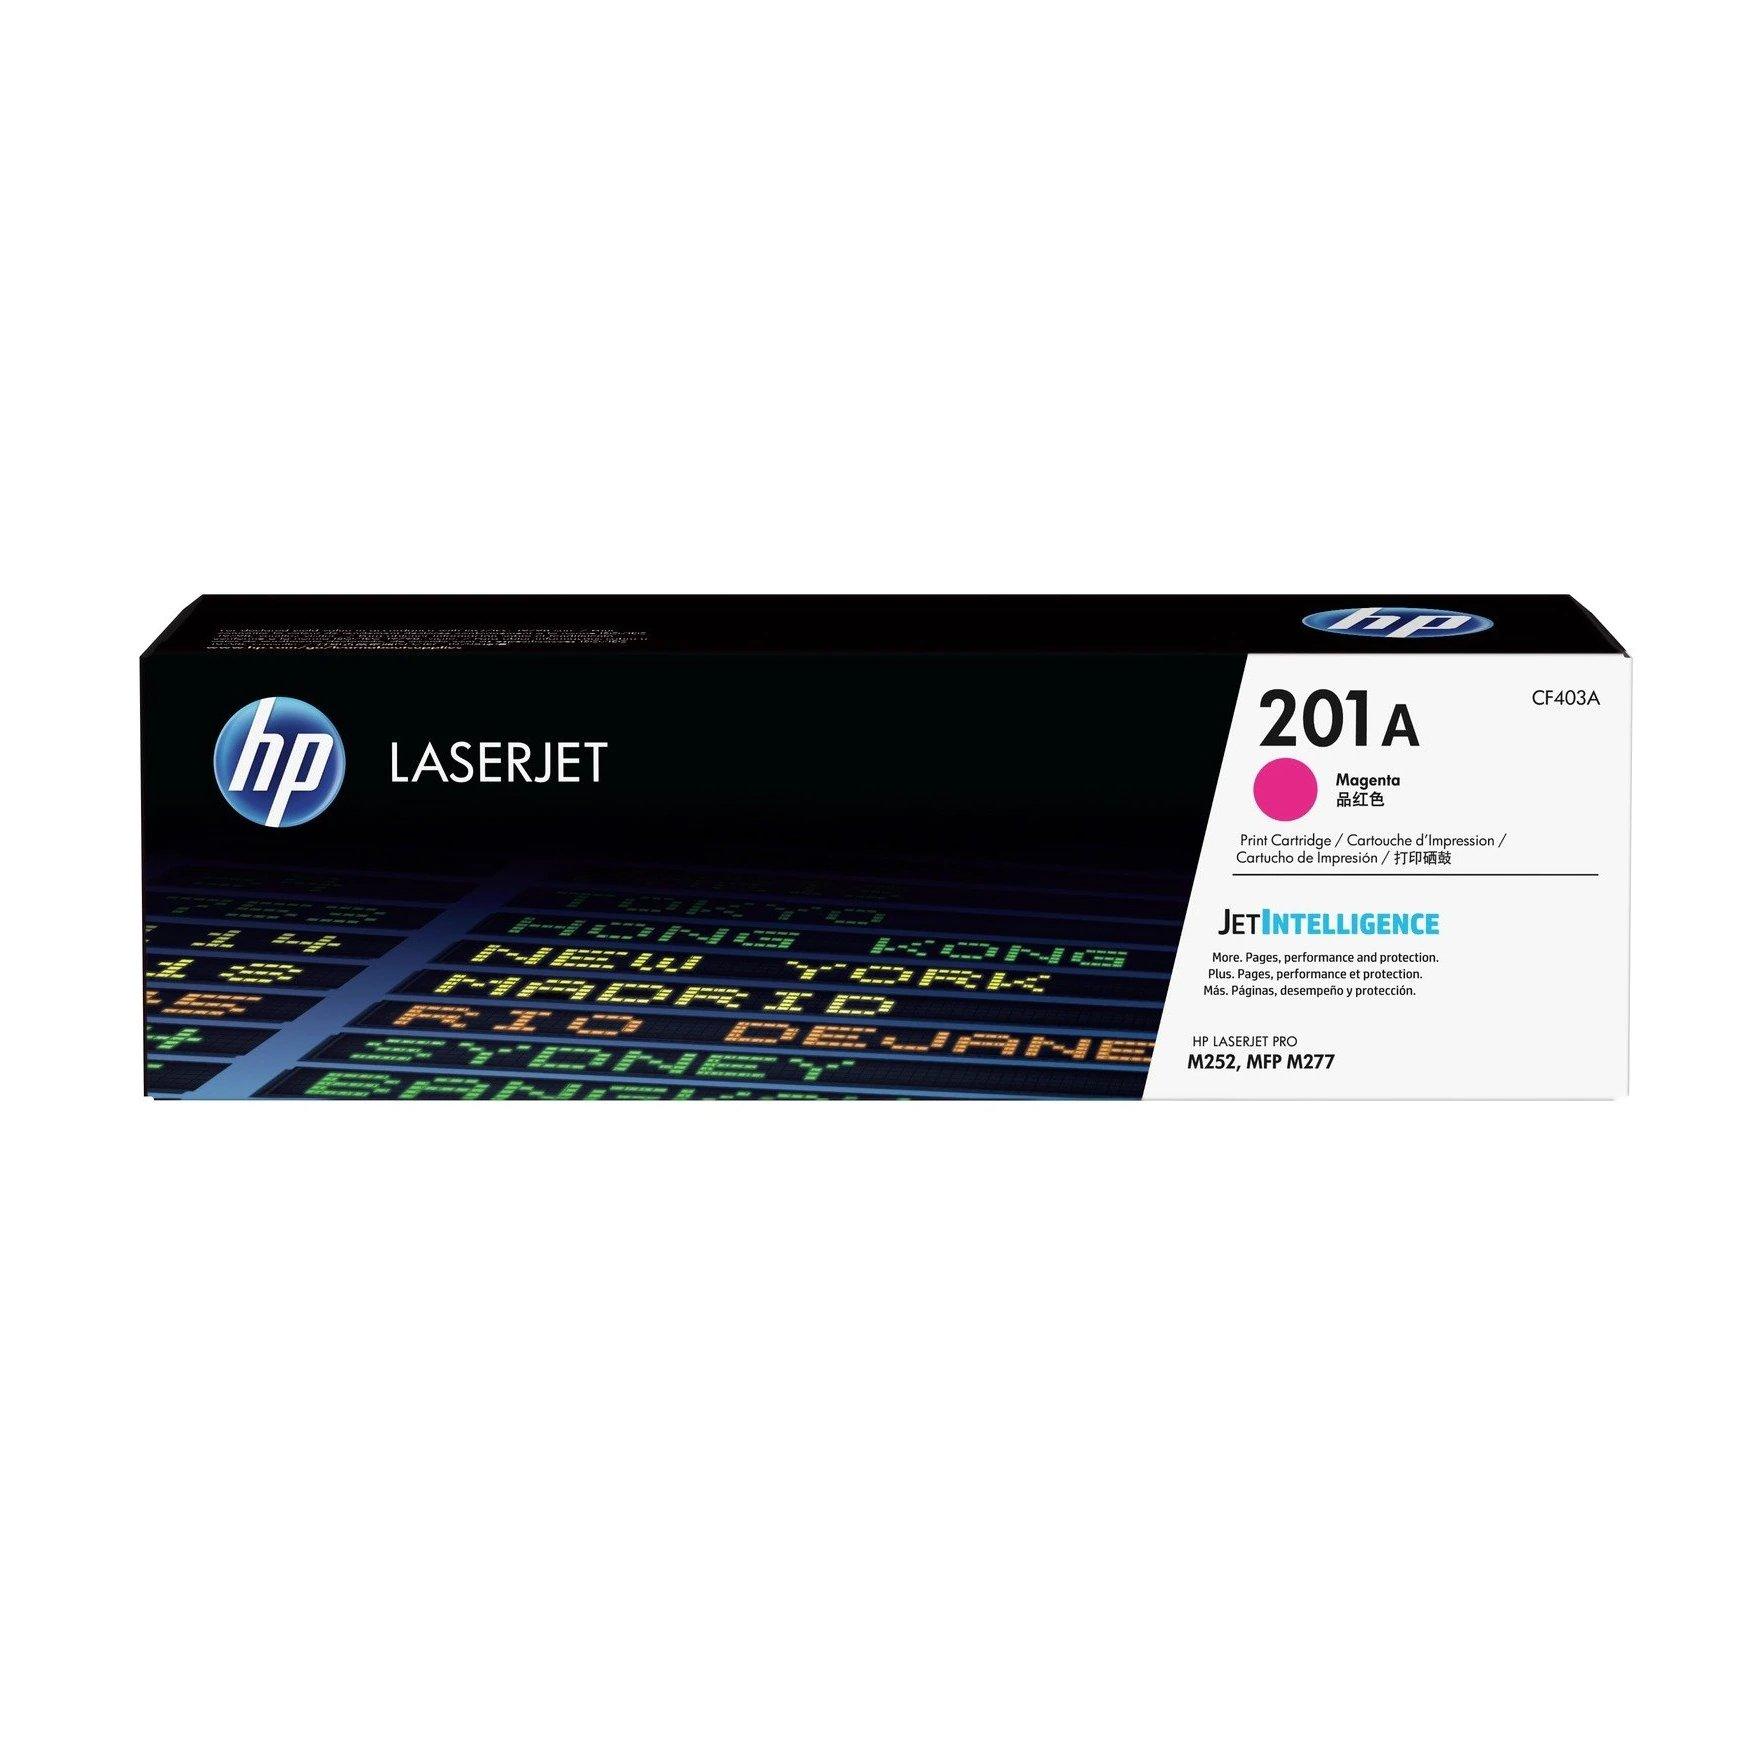 Hewlett Packard [HP] 201A LaserJet Toner Cartridges Page Life 1400pp Magenta Ref CF403A